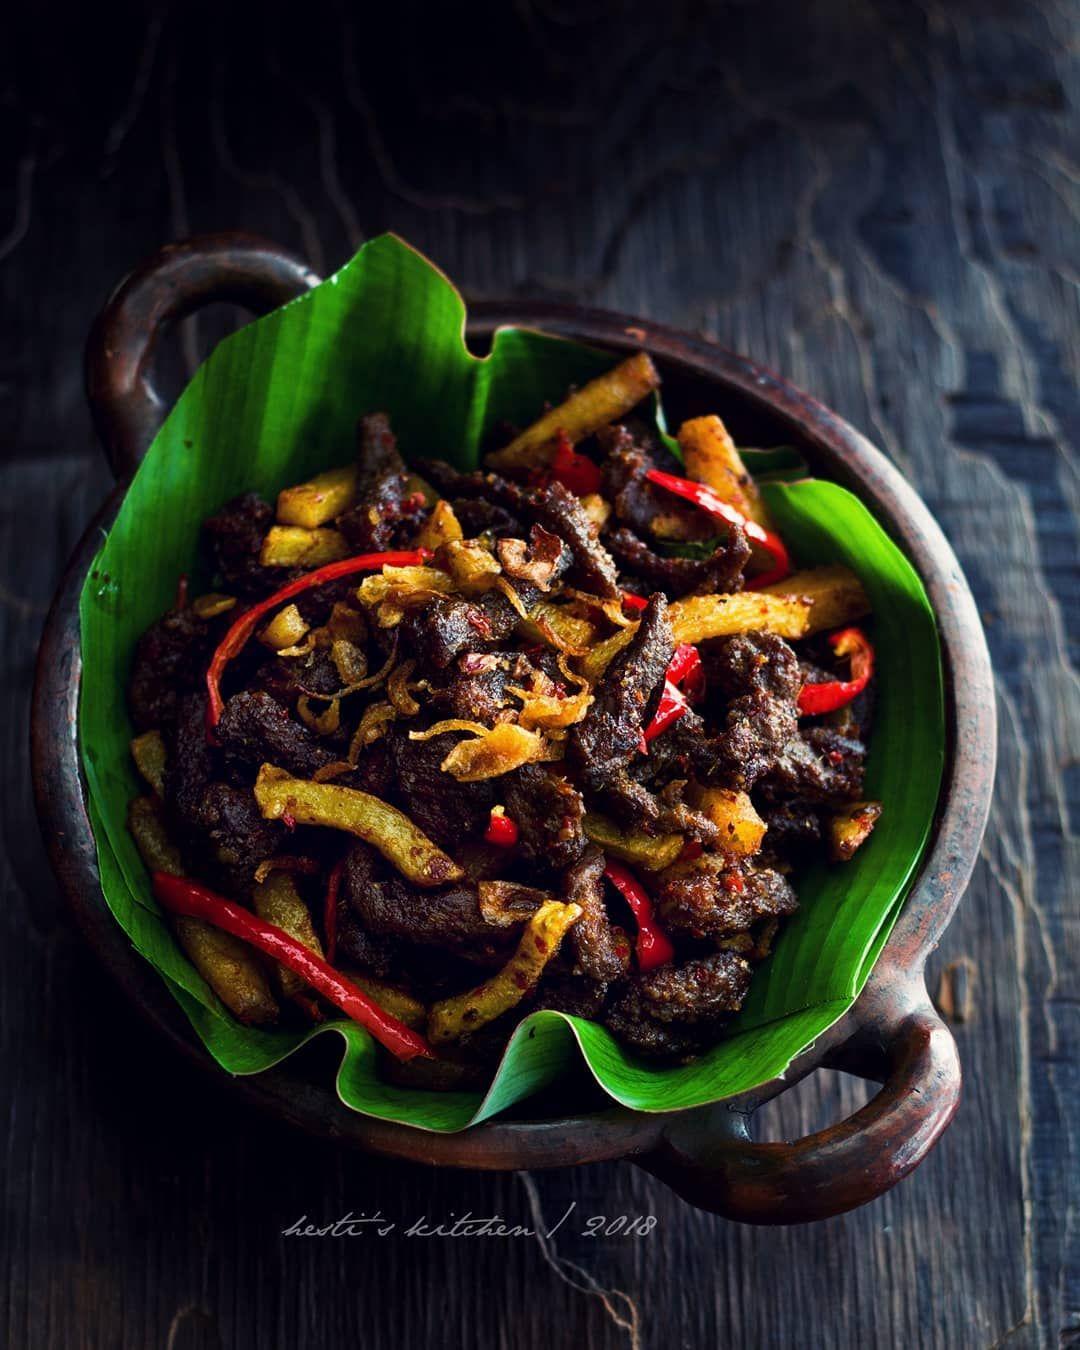 Hestihh Di Instagram Sambel Goreng Daging Resep Masakan Mama Favoritku Uenaaaak Empuuuk Lembut Dagingnya Ketemu Bumbu Yg Sedikit Manis Aroma Lengkuas